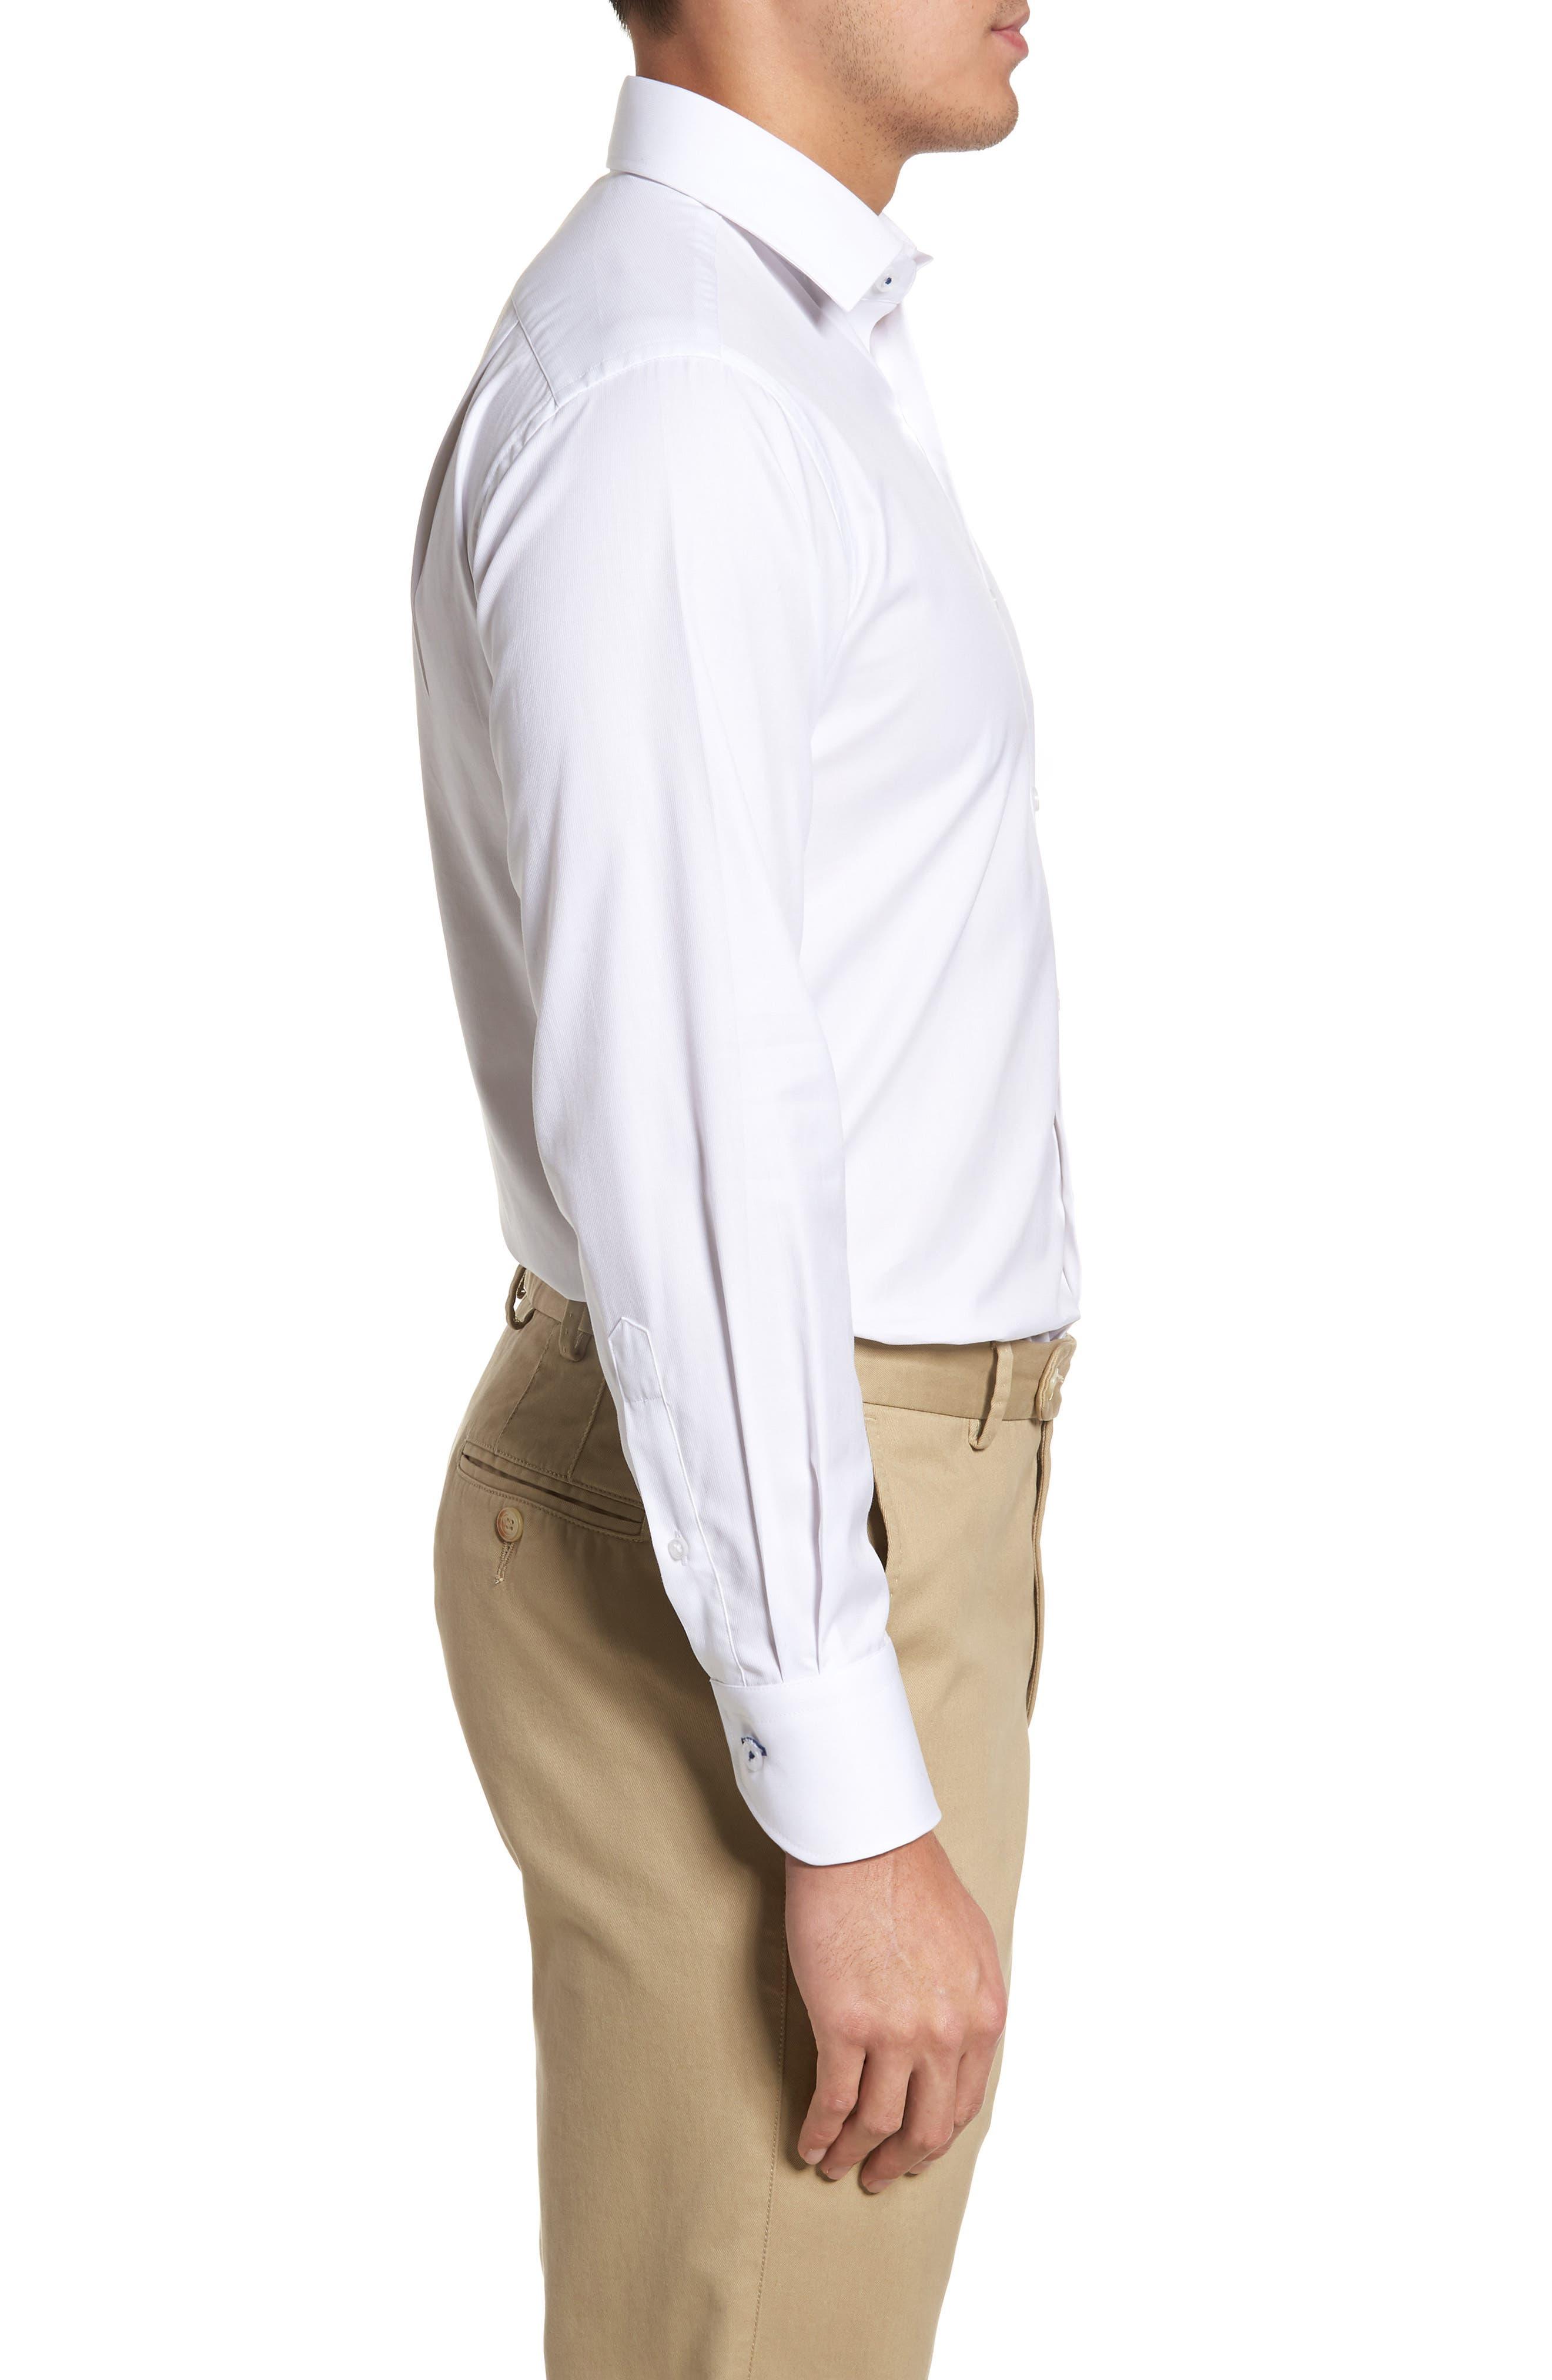 LORENZO UOMO, Trim Fit Solid Dress Shirt, Alternate thumbnail 4, color, WHITE